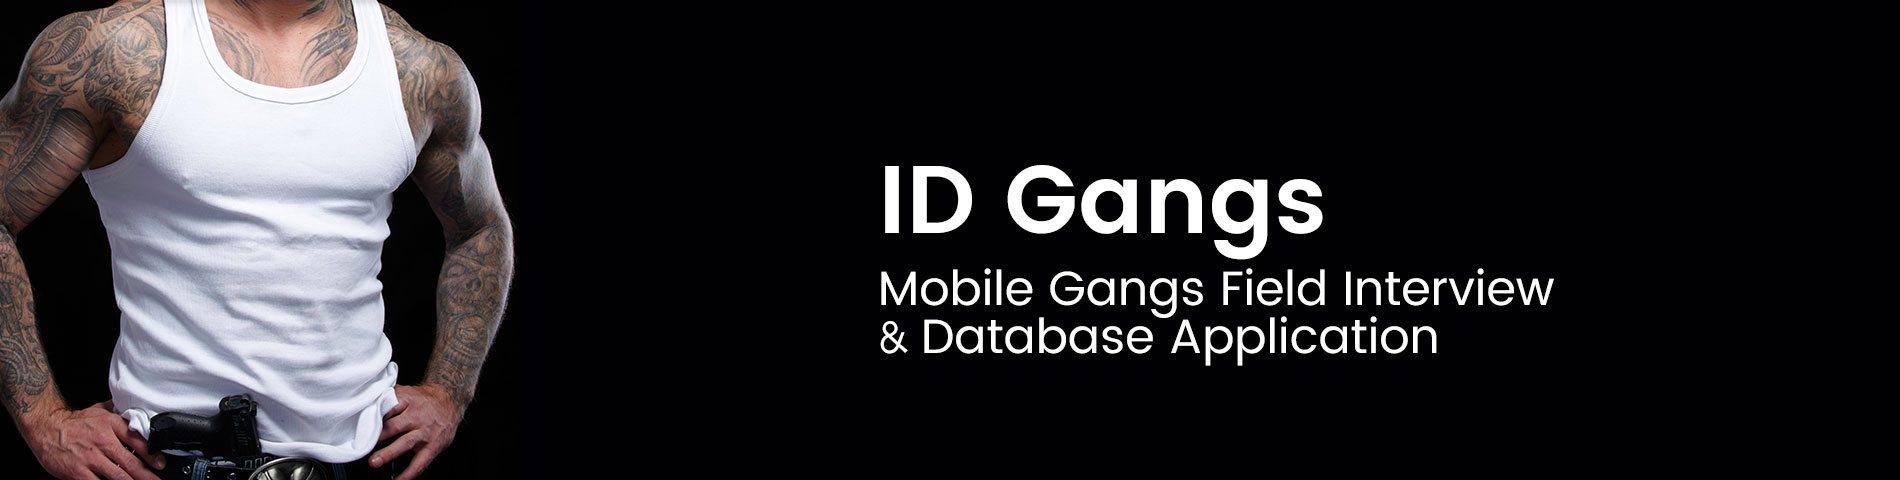 Gang Member Biometric Identification System